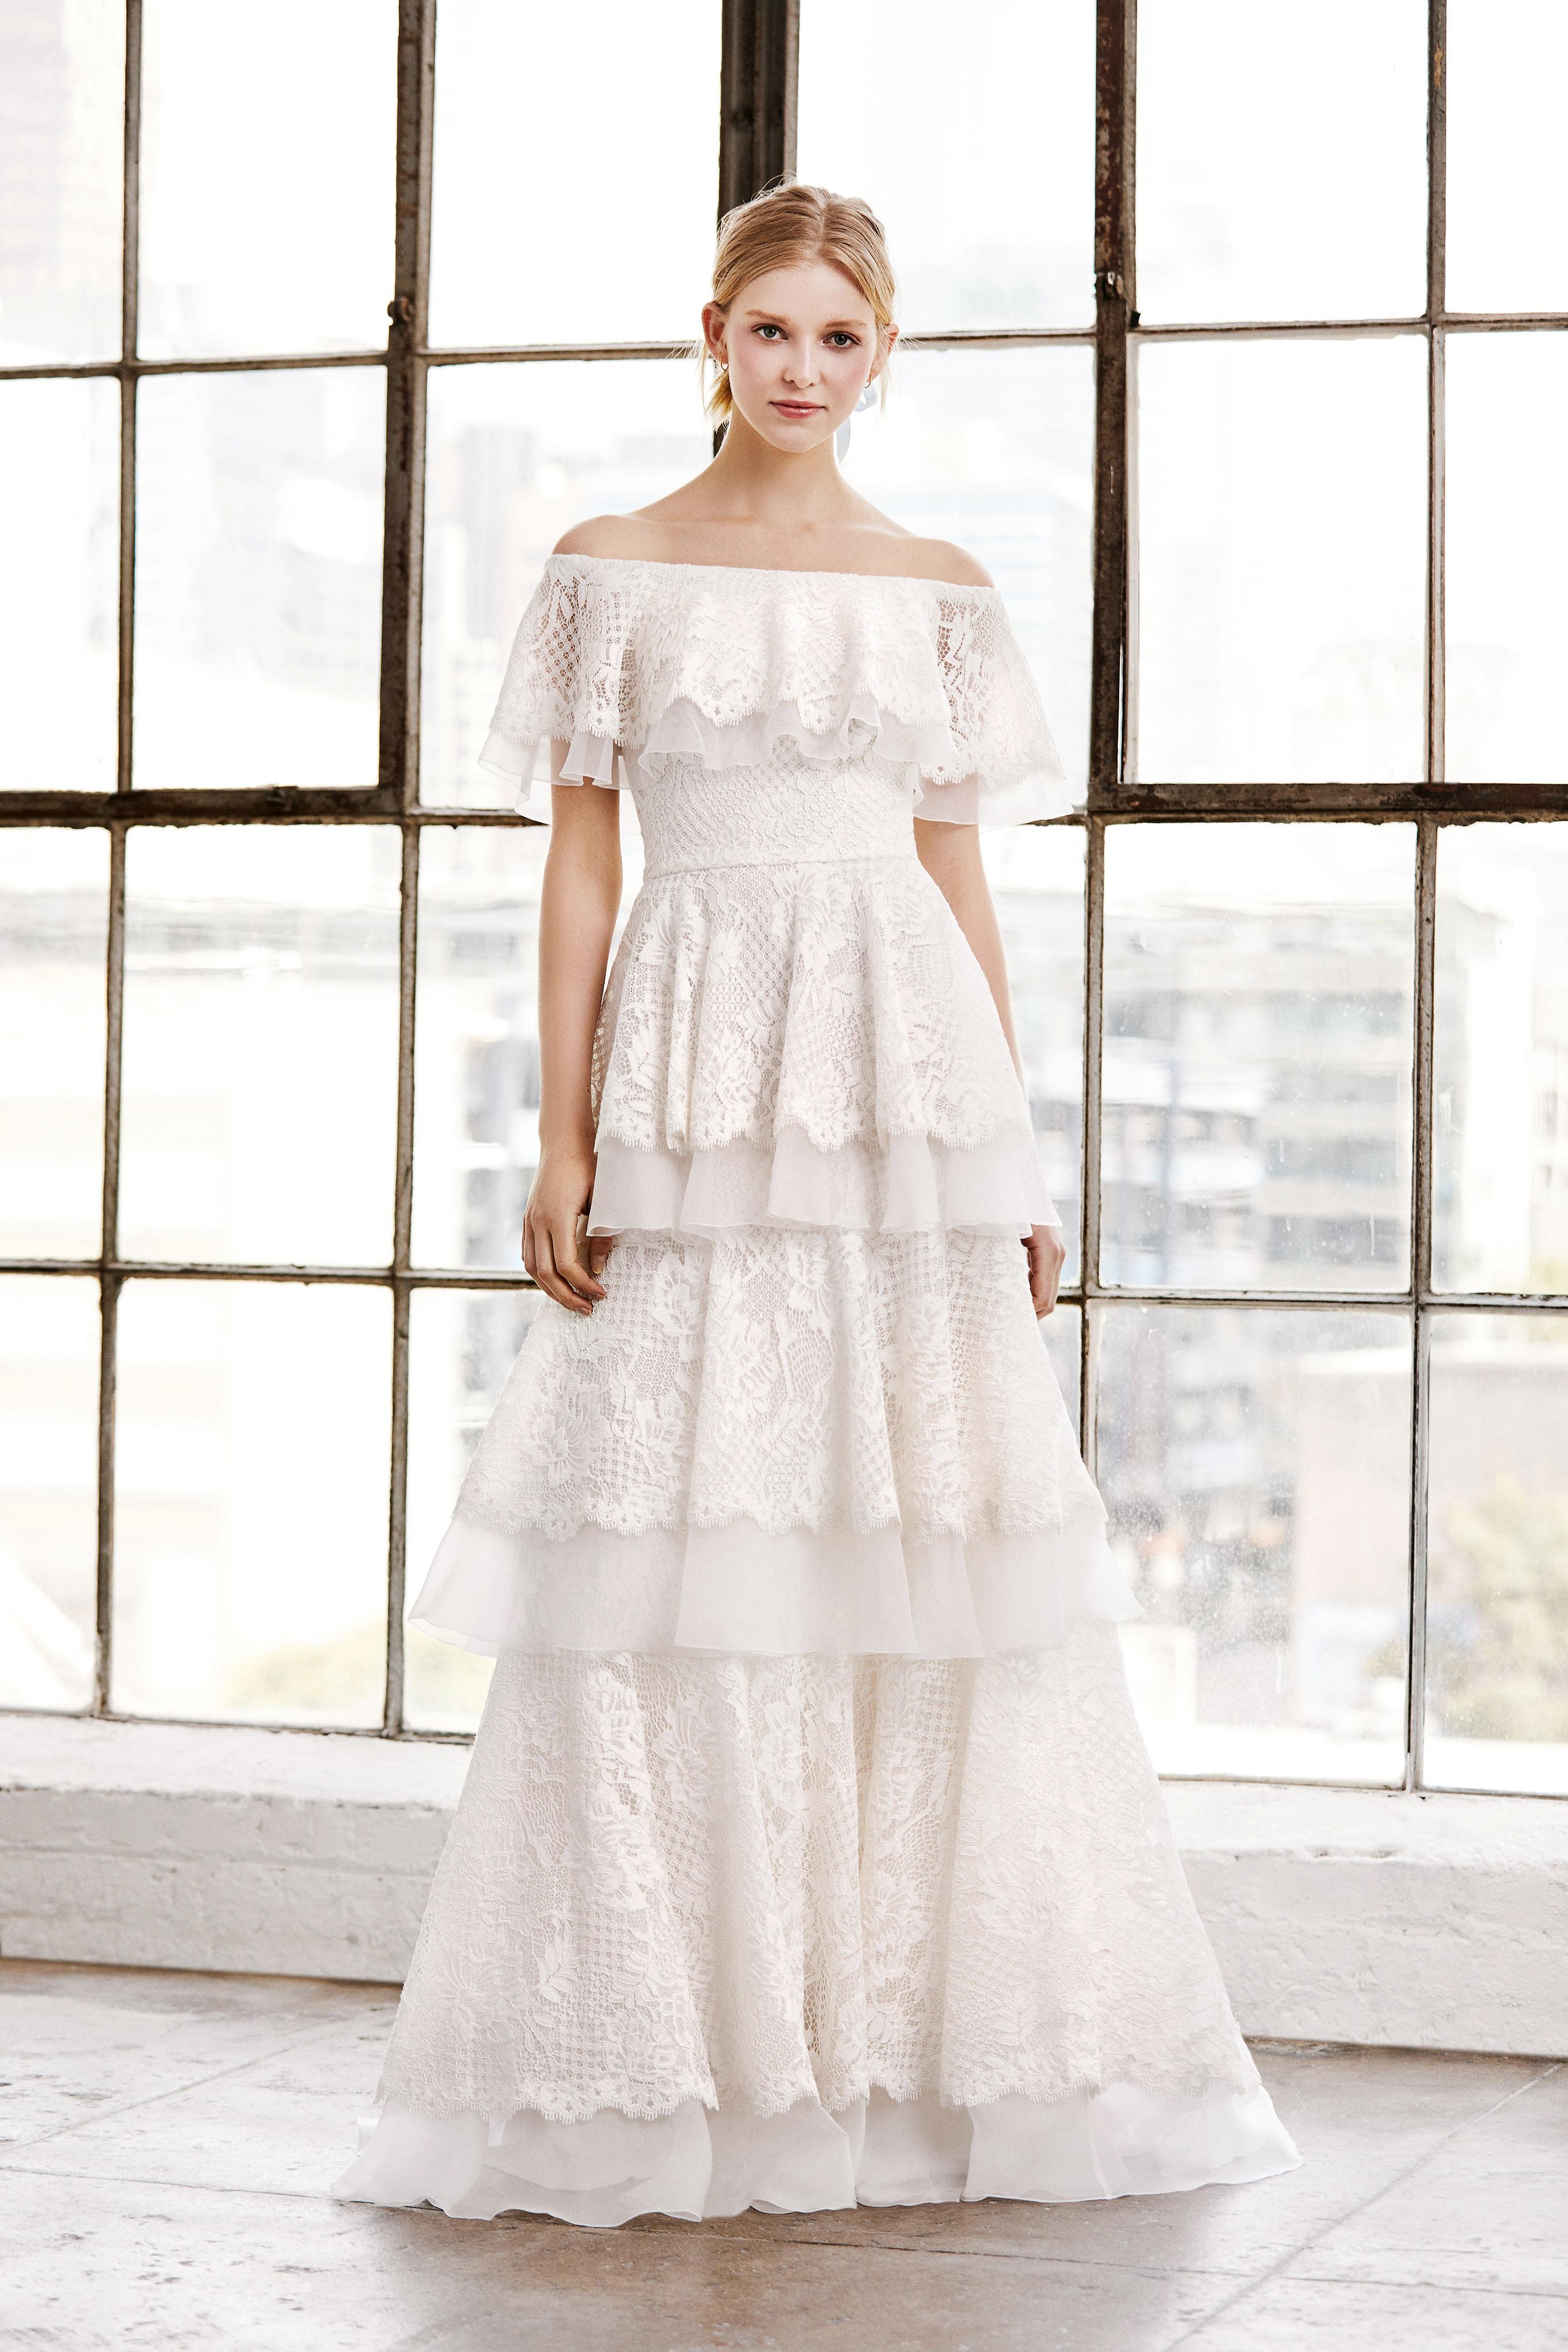 tadashi shoji wedding dress spring 2019 off the shoulder lace tiers